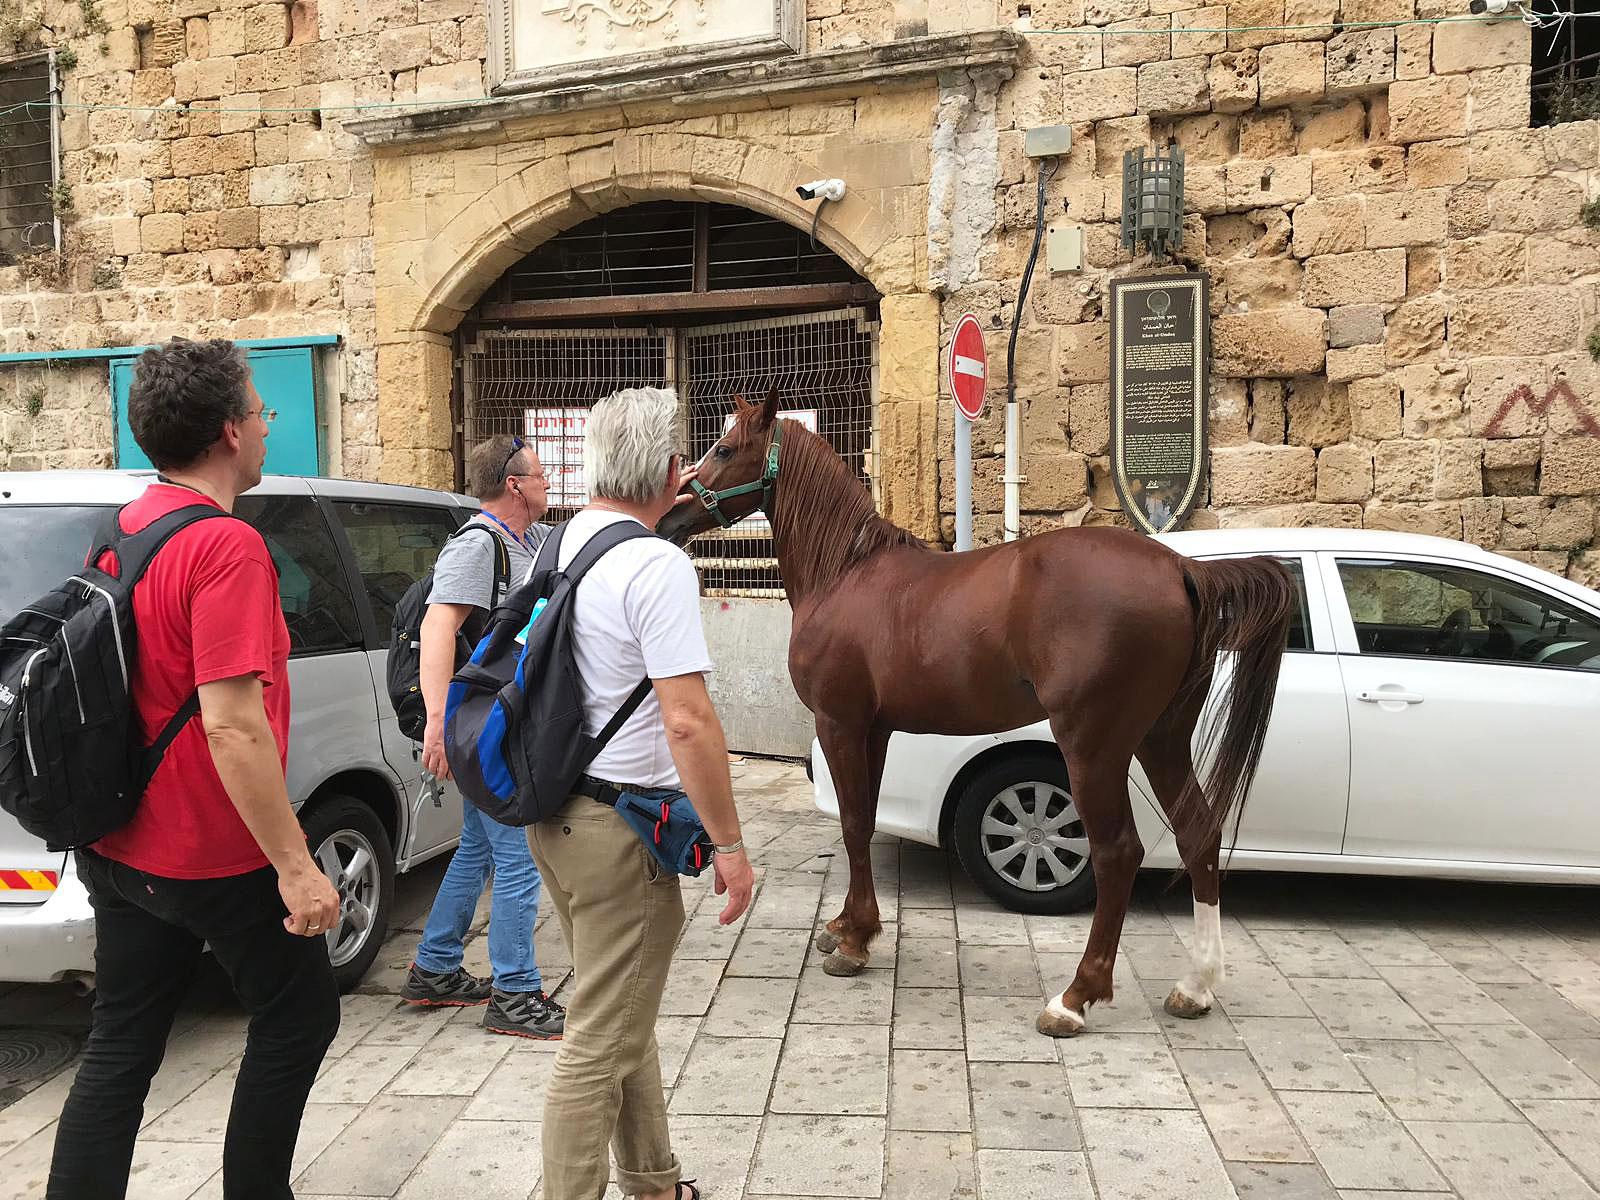 Israelreise 2019 - Araberhengst in Akko eingefangen